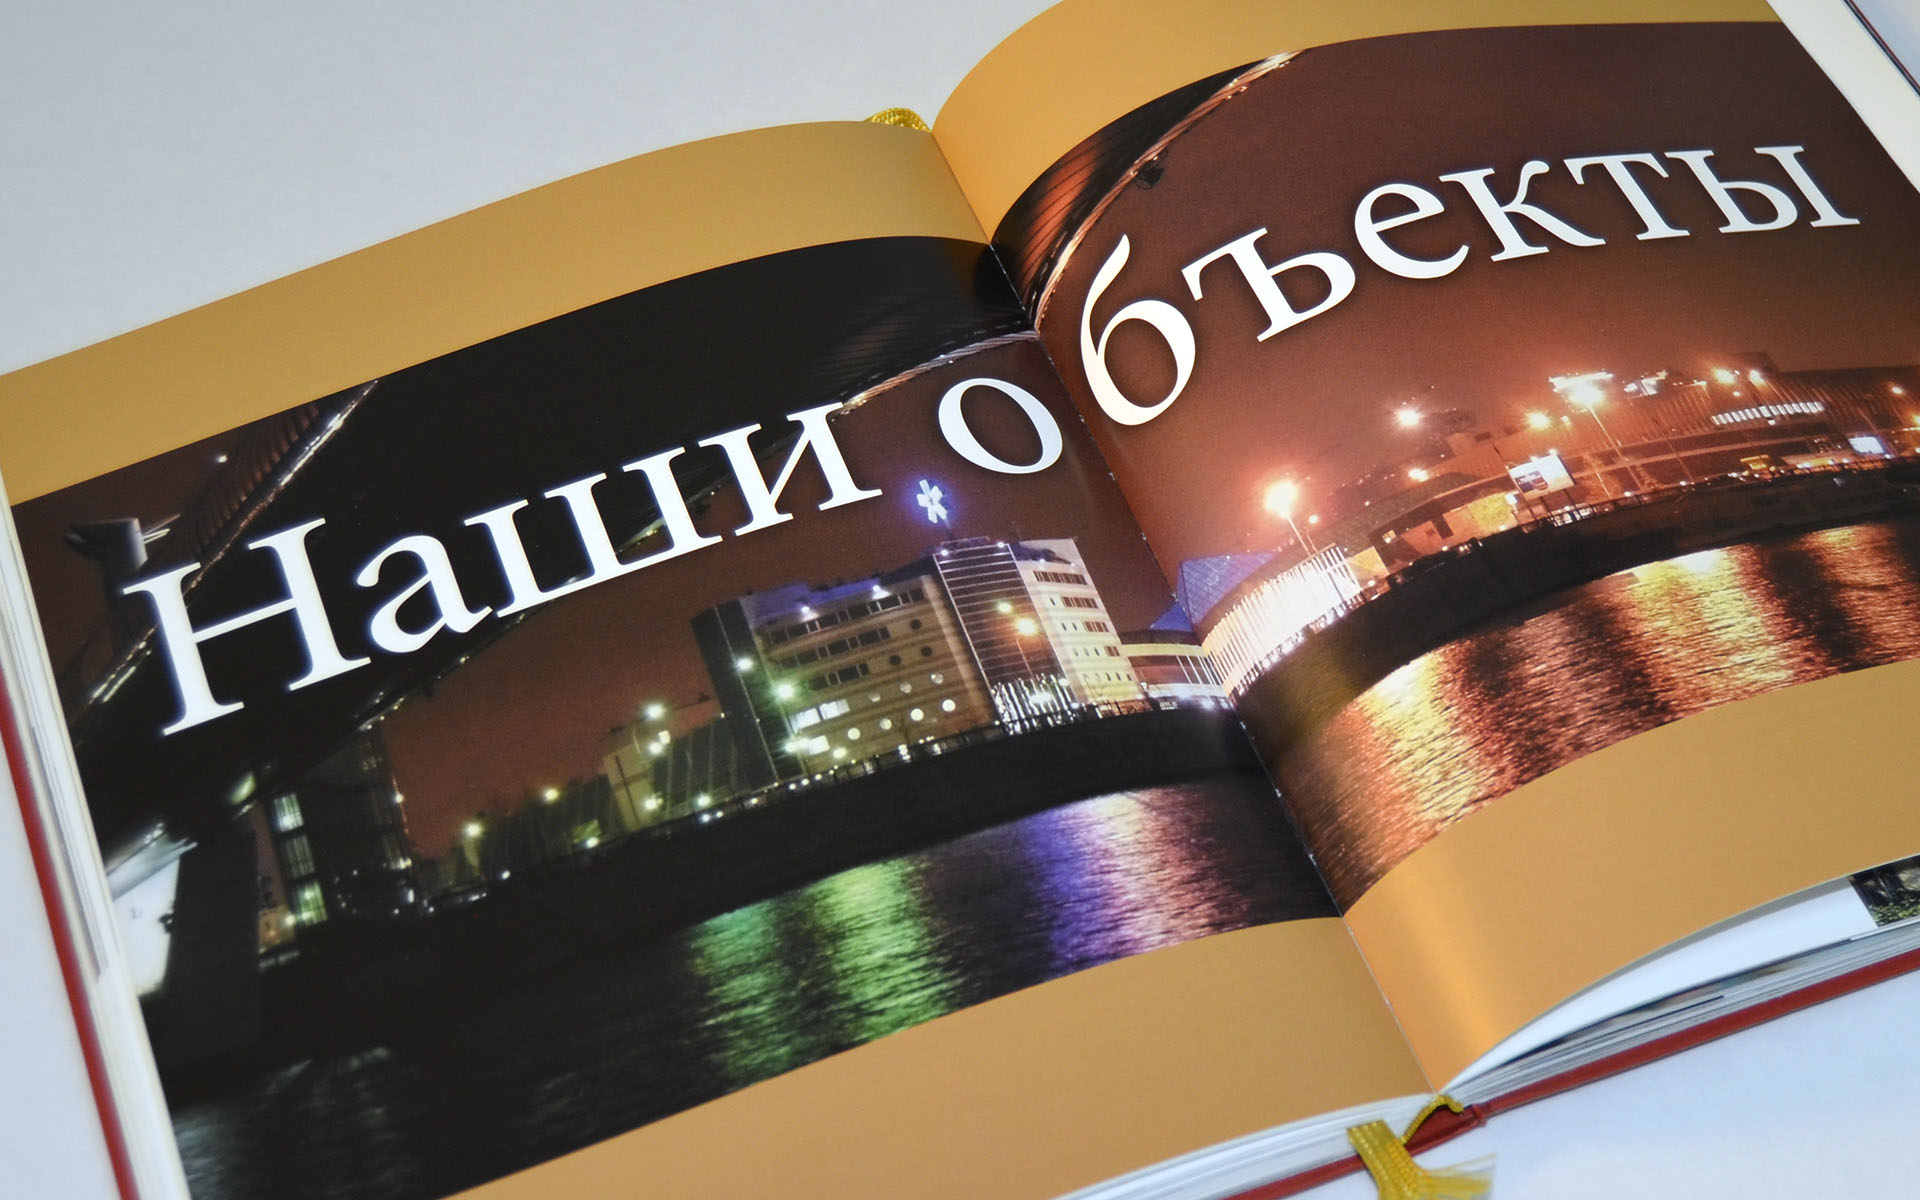 mks_800x500_9 копия